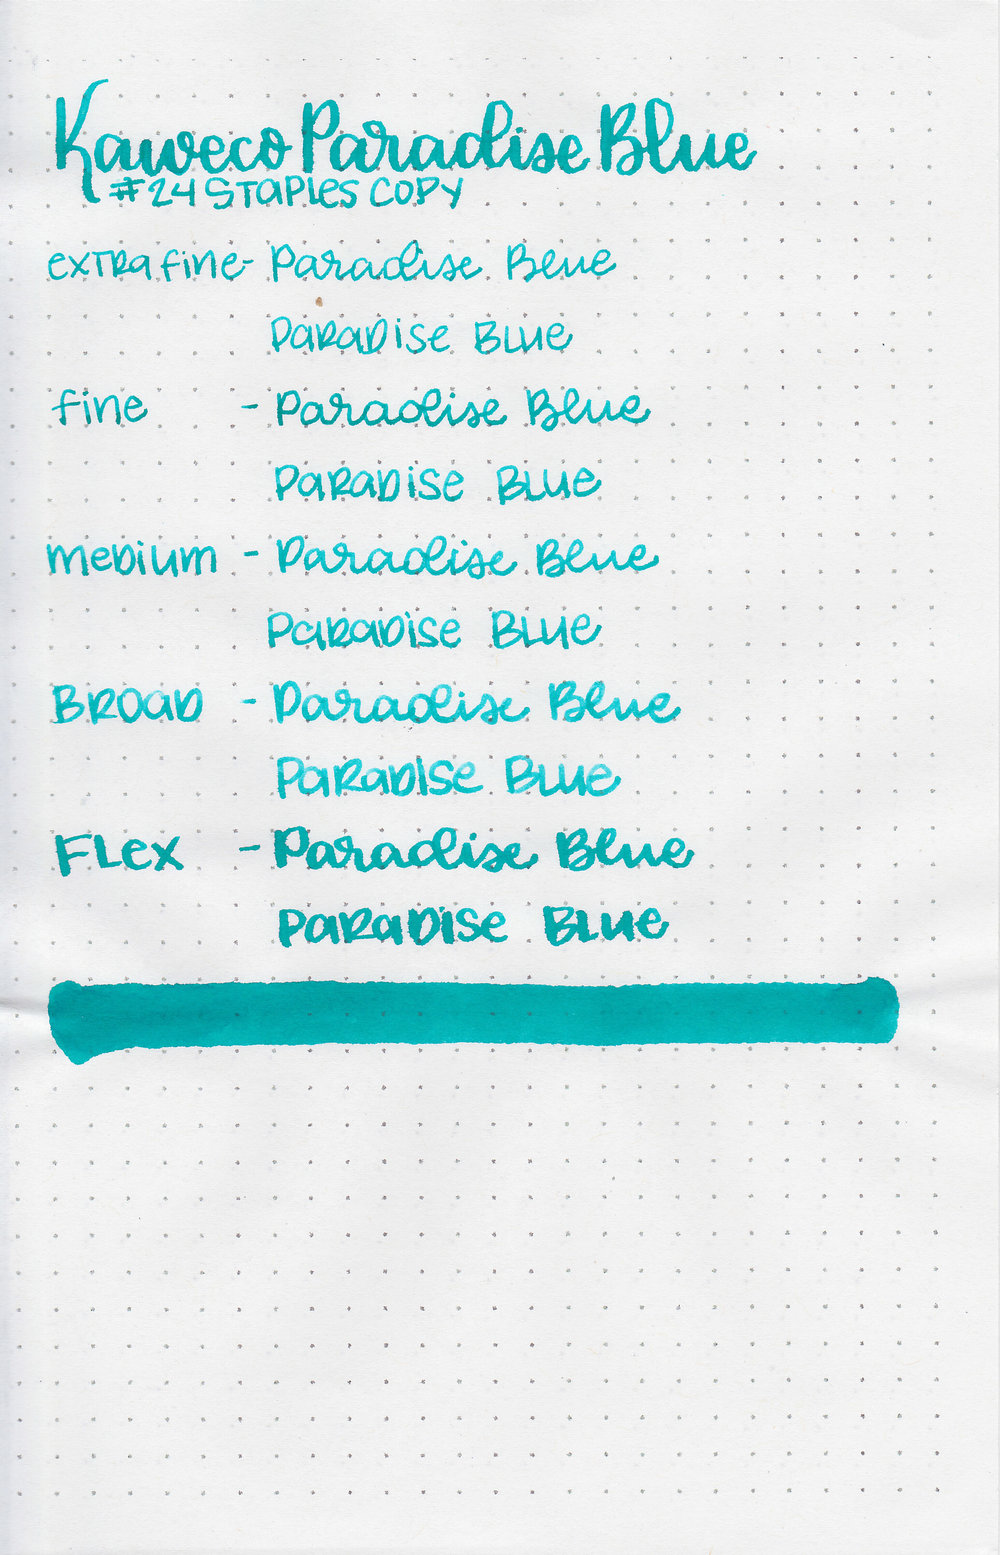 kw-paradise-blue-11.jpg